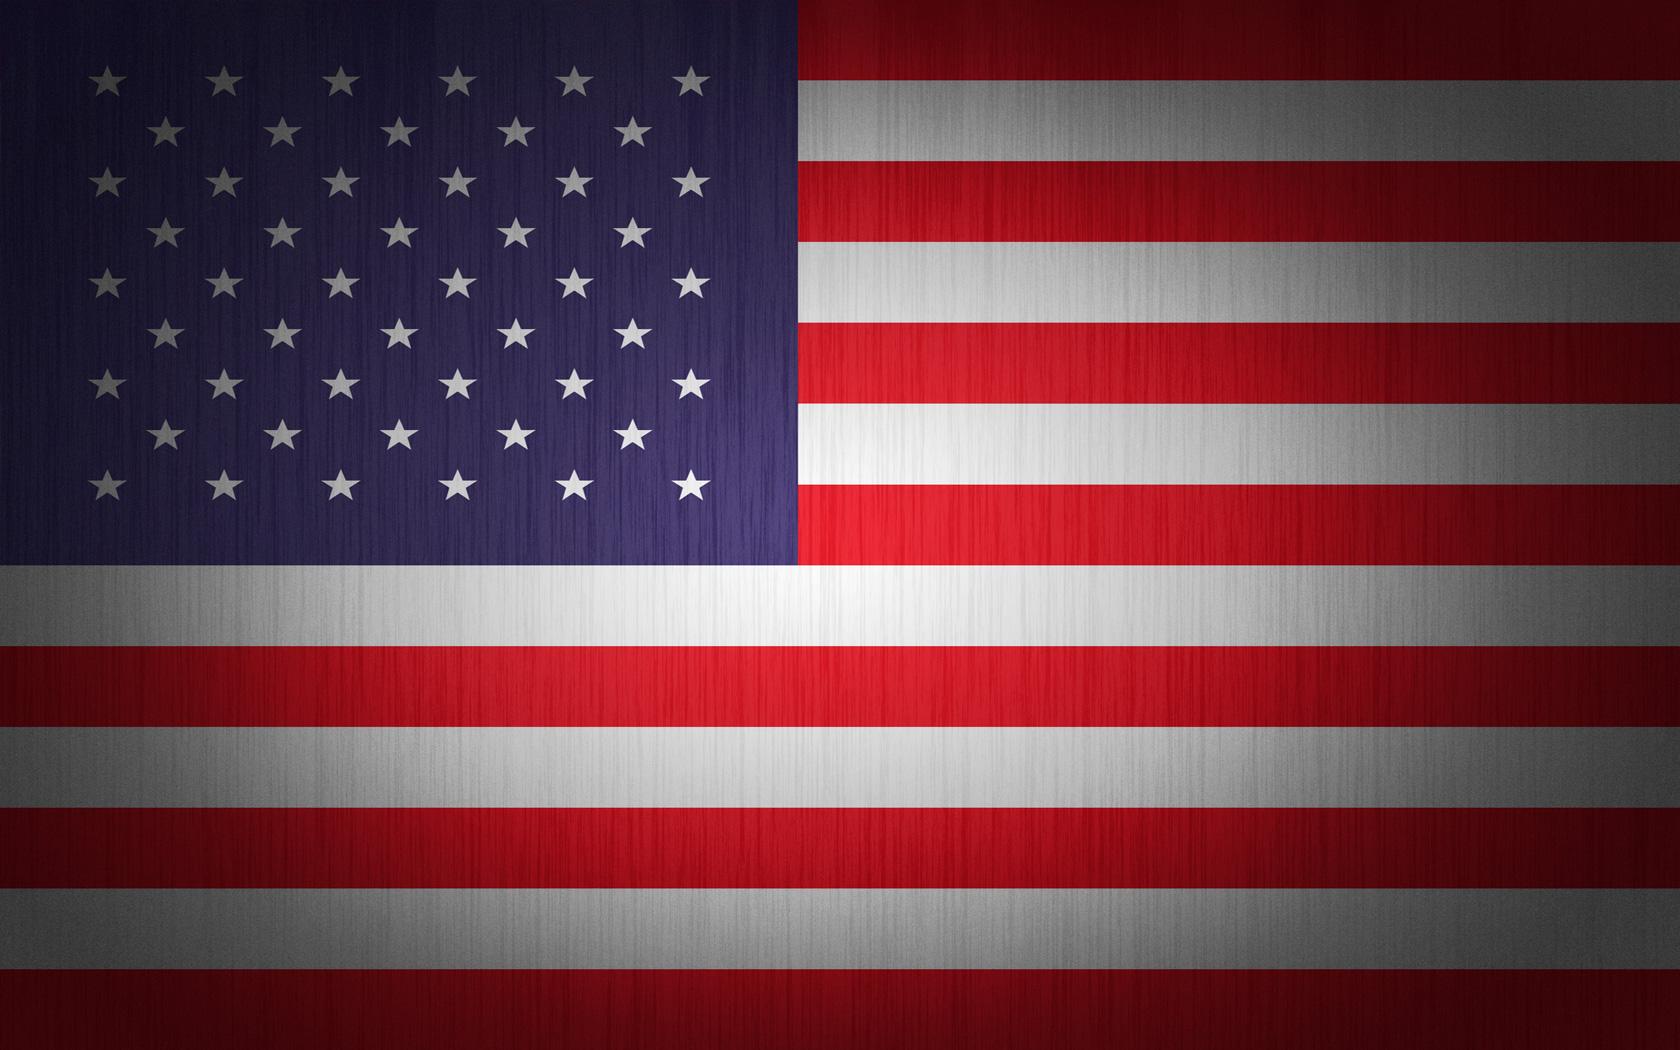 American flag wallpaper hd   SF Wallpaper 1680x1050